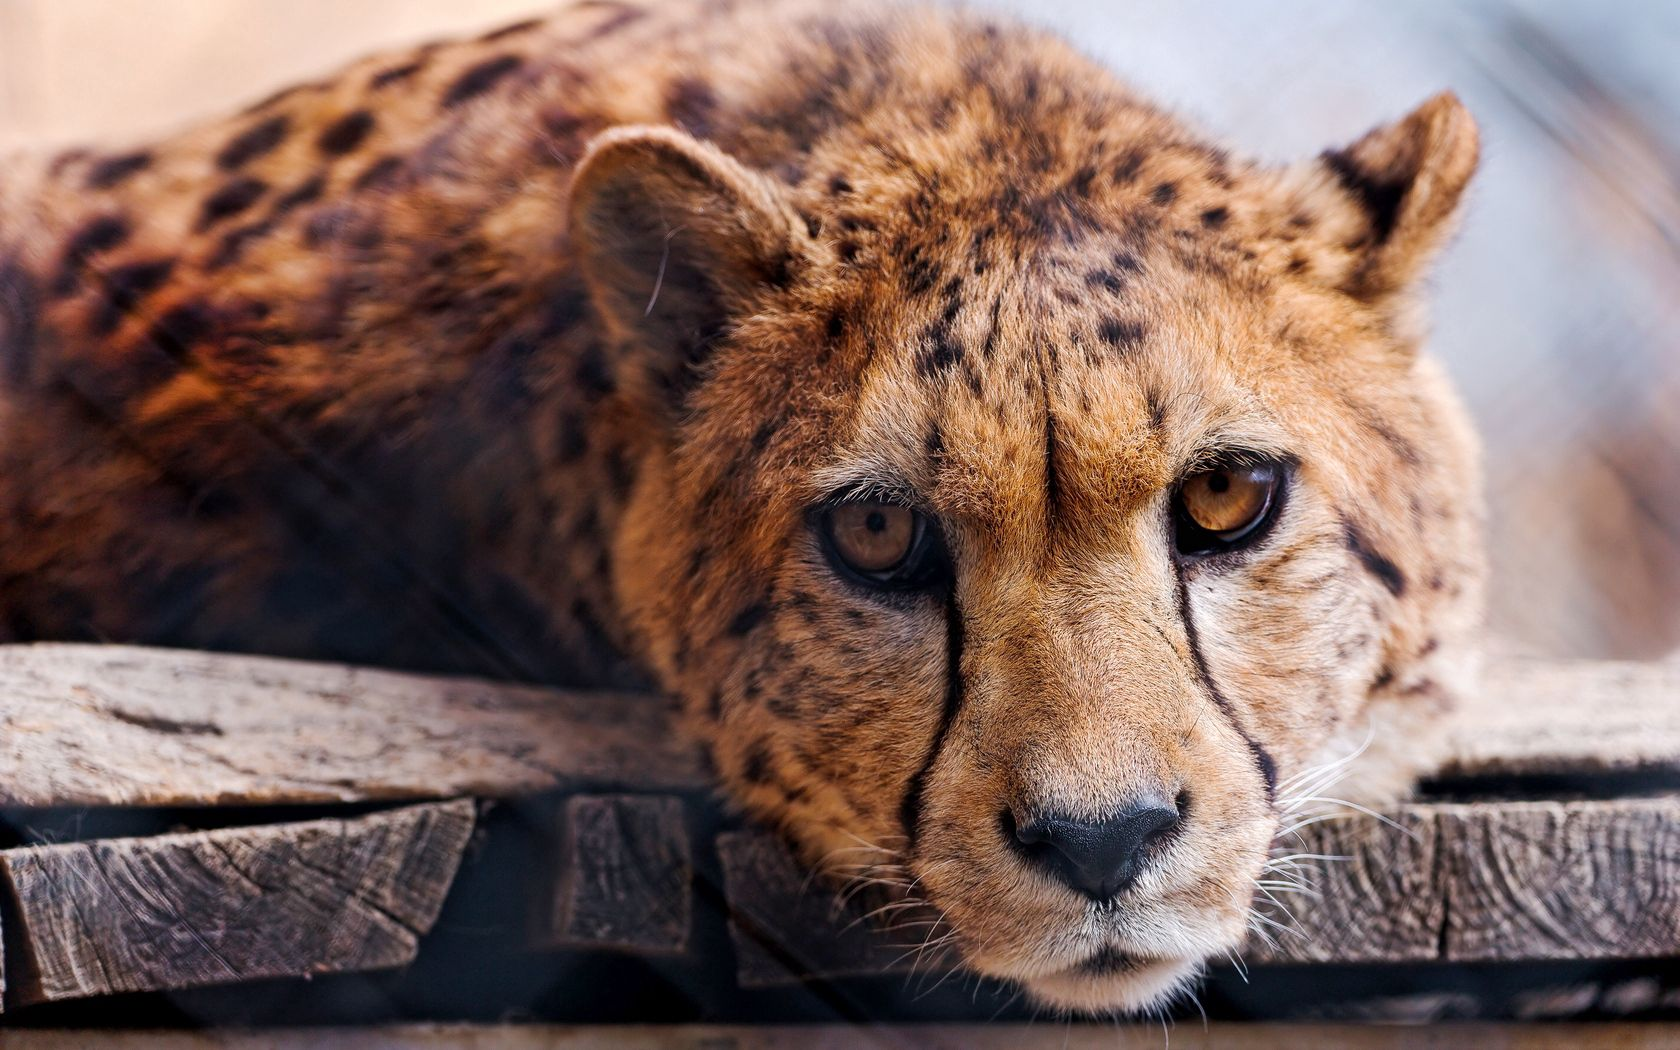 69890 download wallpaper Animals, Cheetah, Muzzle, Predator, Big Cat screensavers and pictures for free